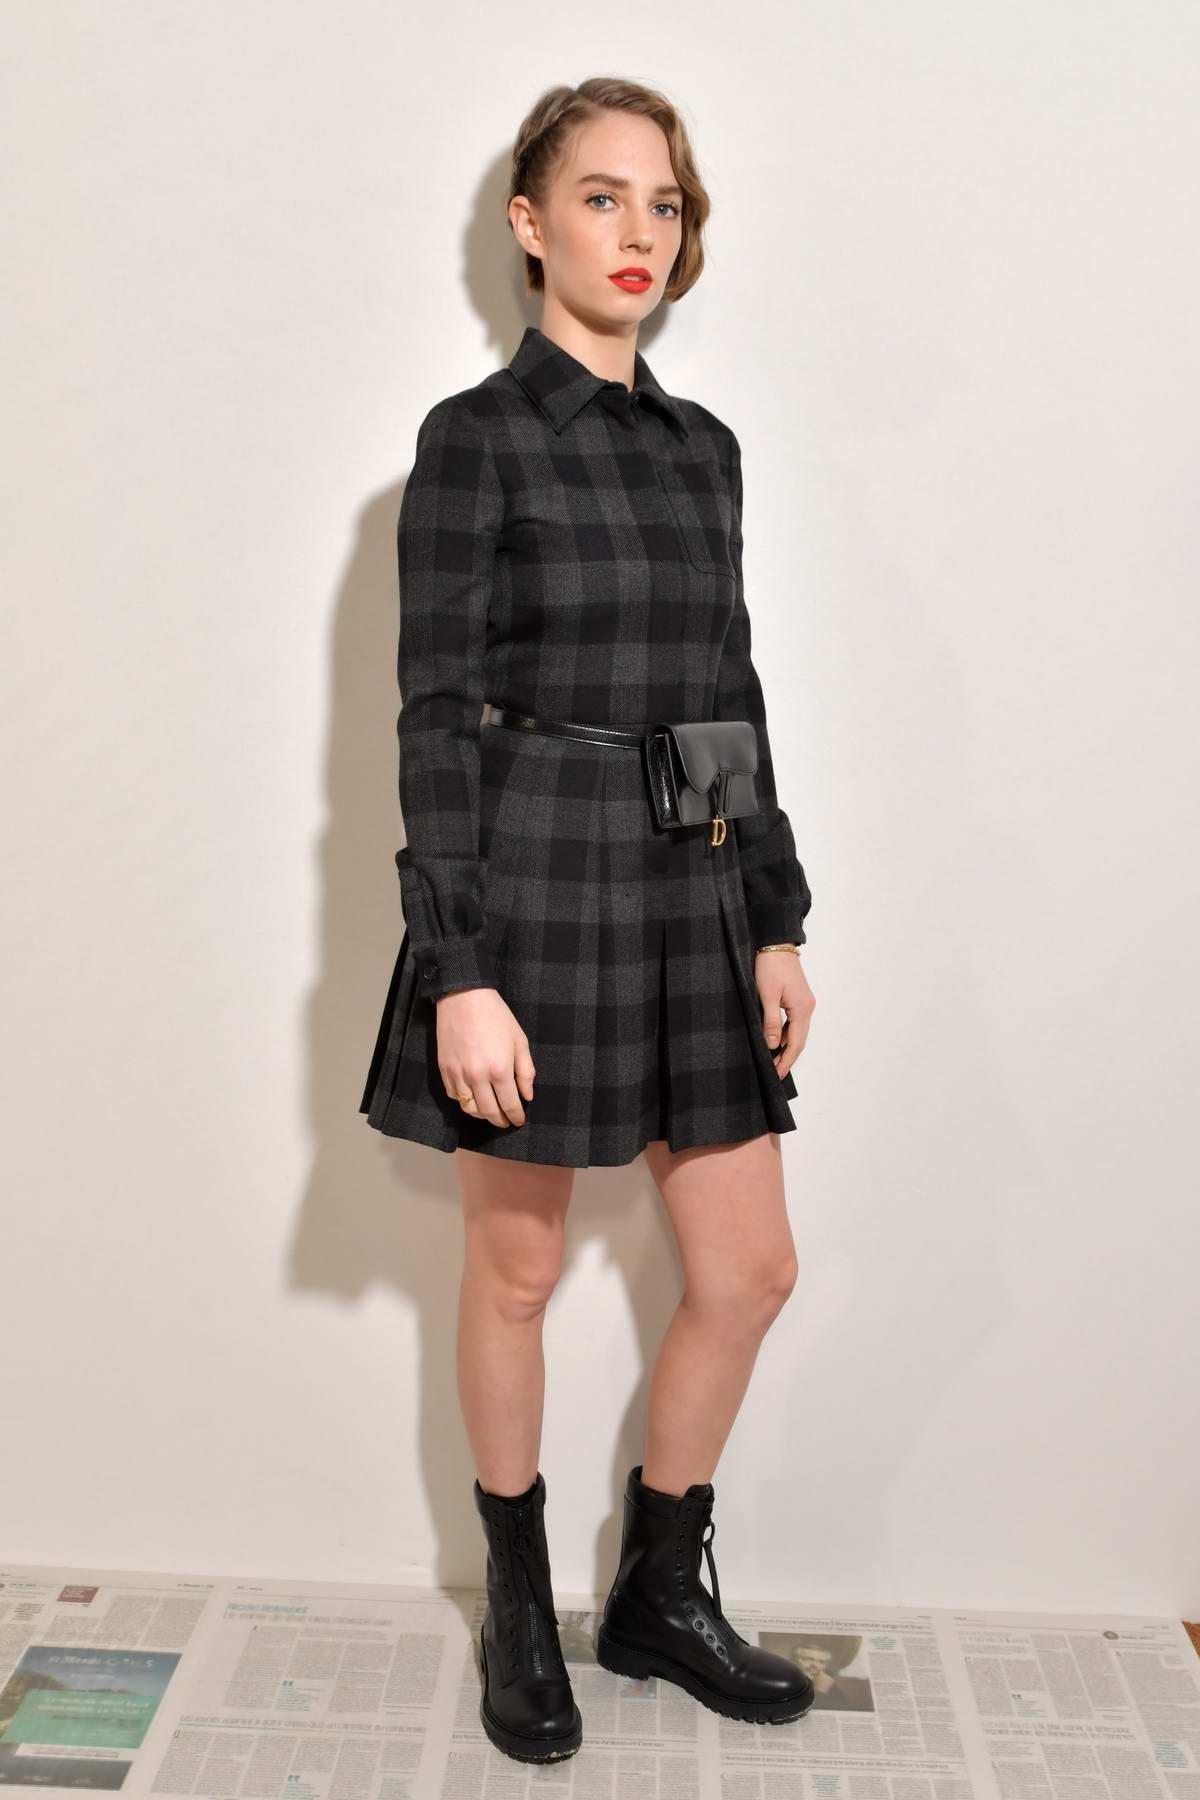 Maya Hawke attends the Dior show, F/W 2020 during Paris Fashion Week in Paris, France